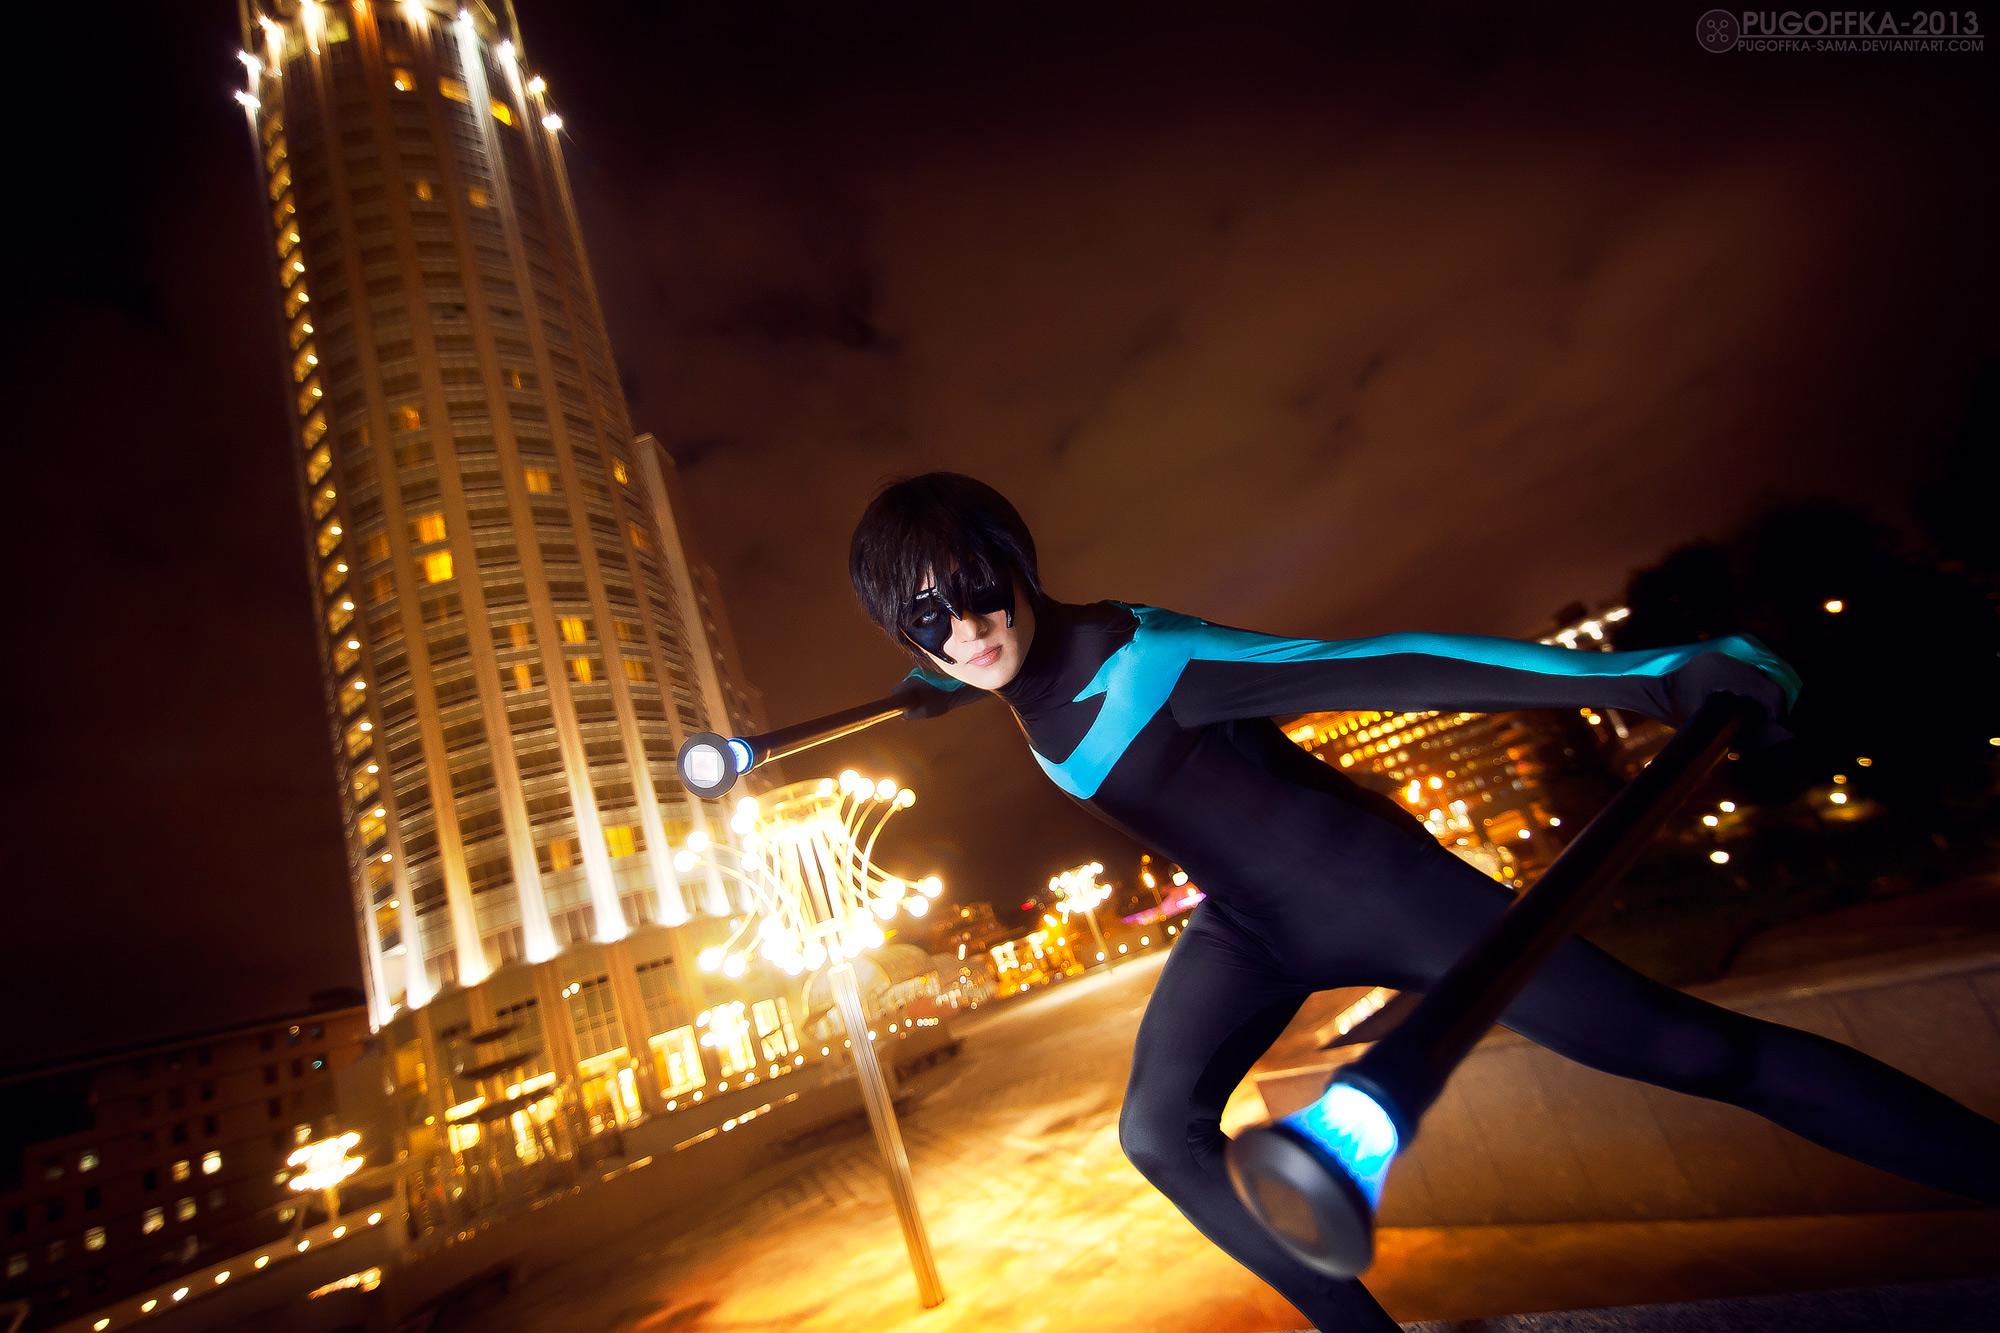 Amethyst Prince  is Nightwing   Photo by  Pugoffka-Sama